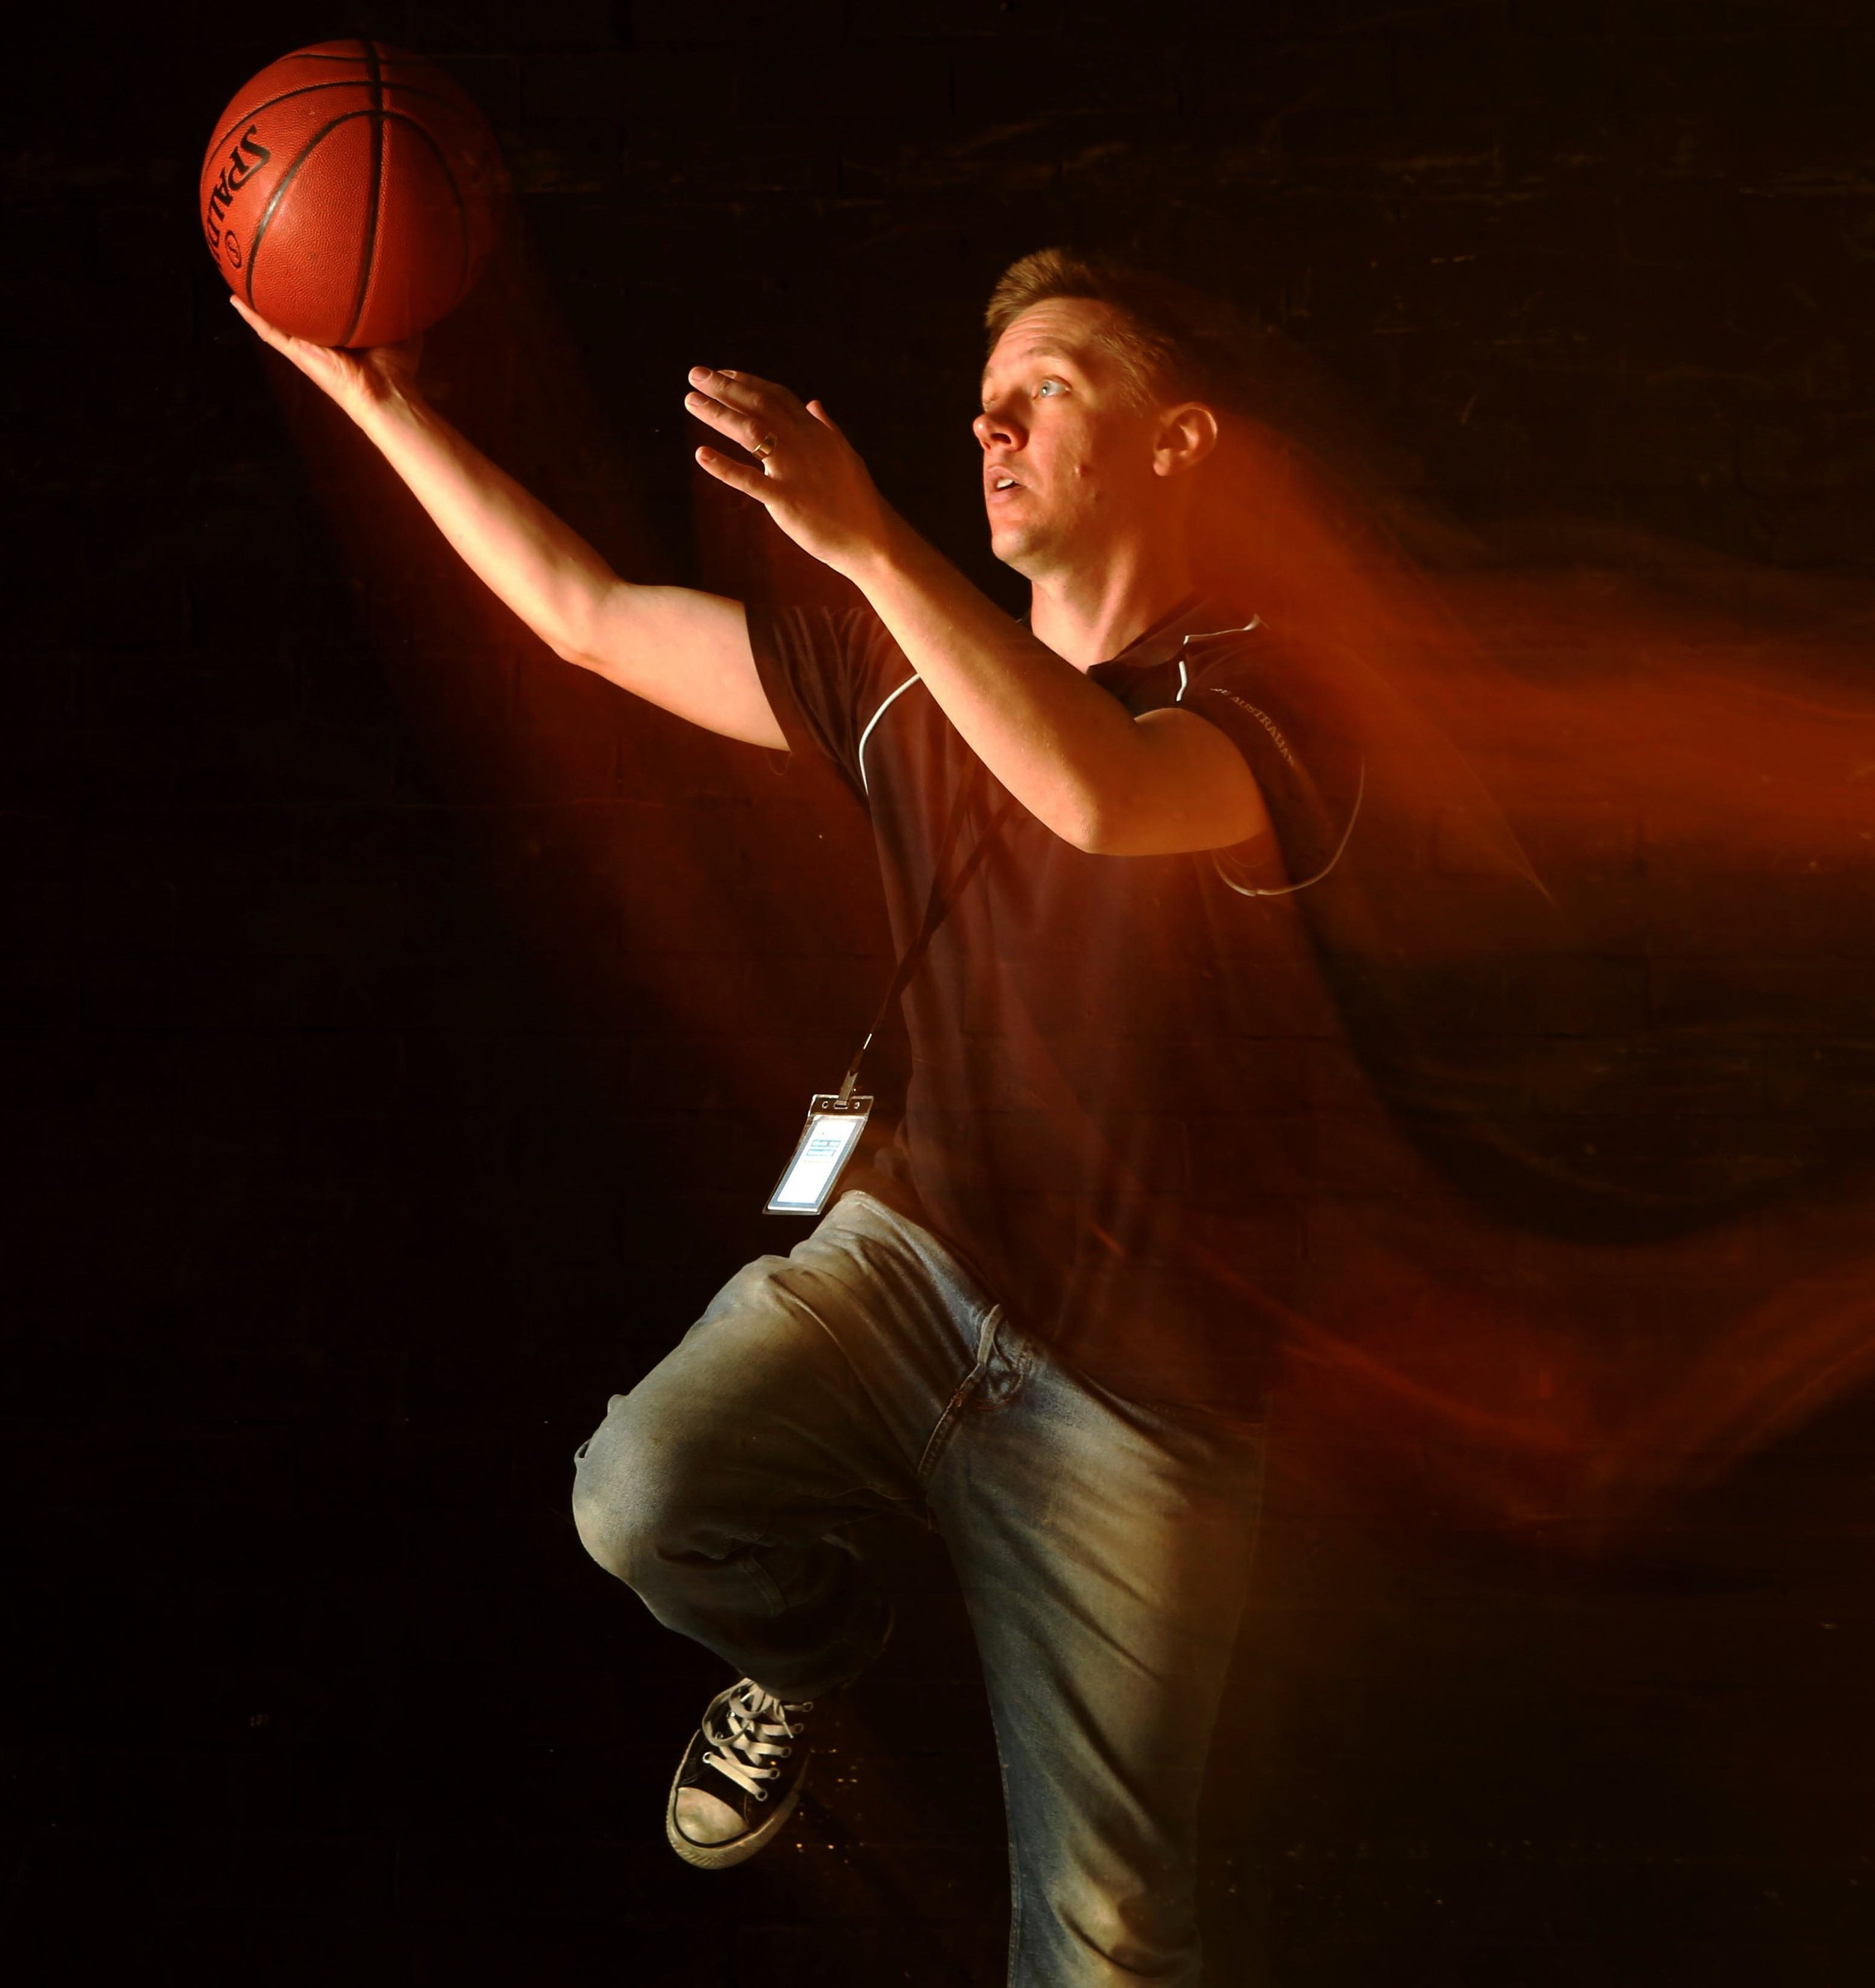 Photographer. Family Man. Basketball Tragic